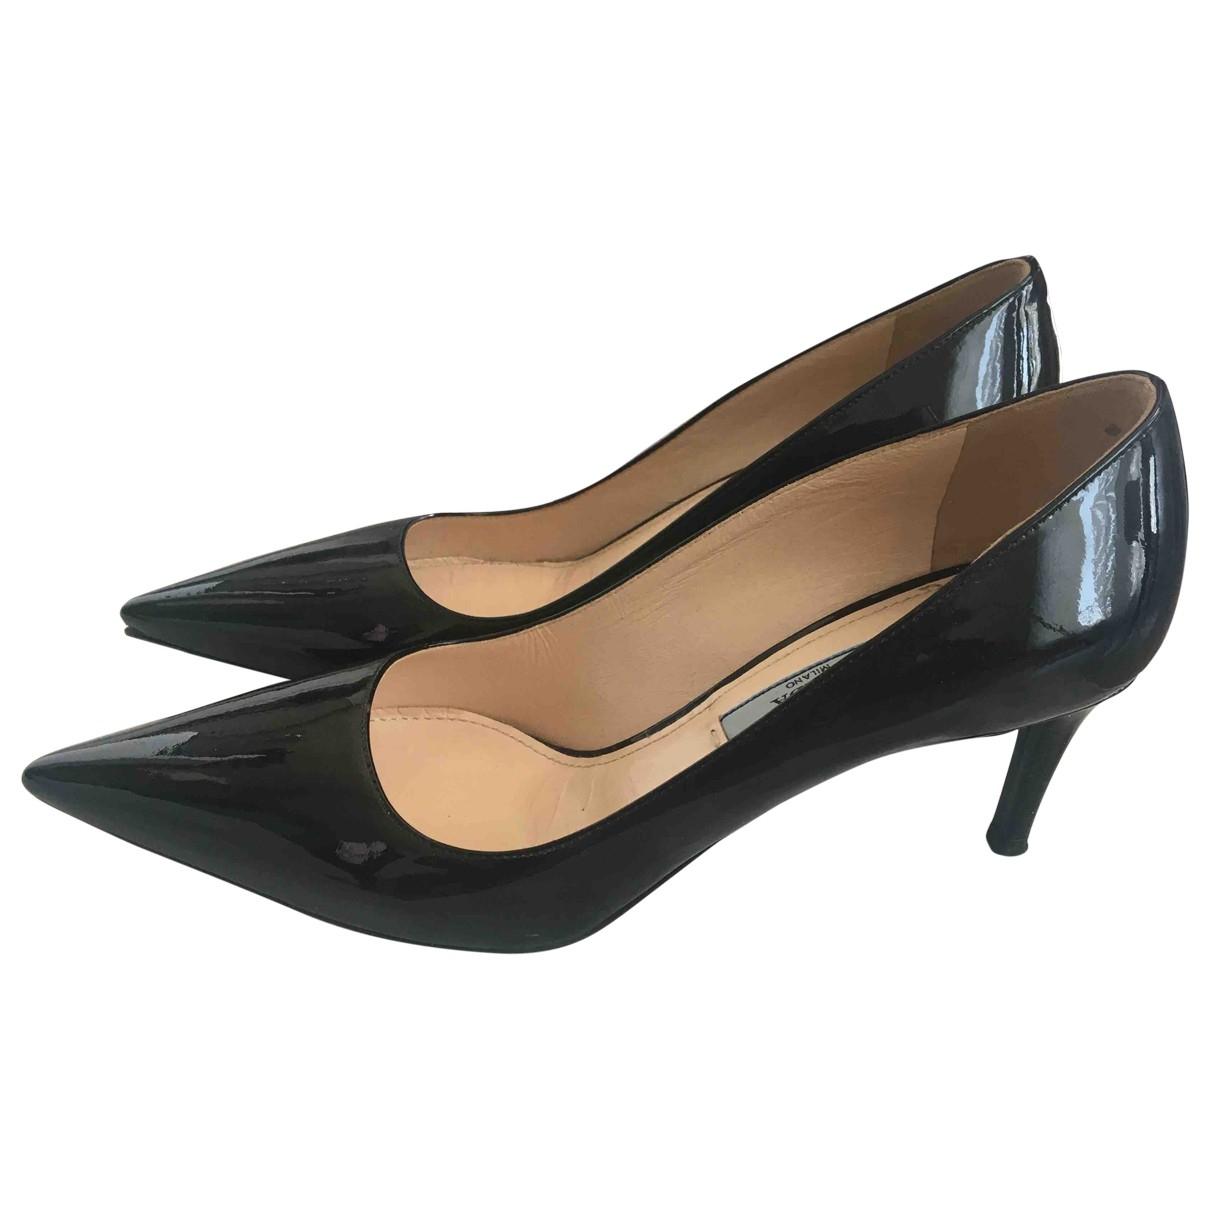 Prada \N Black Patent leather Heels for Women 36 EU